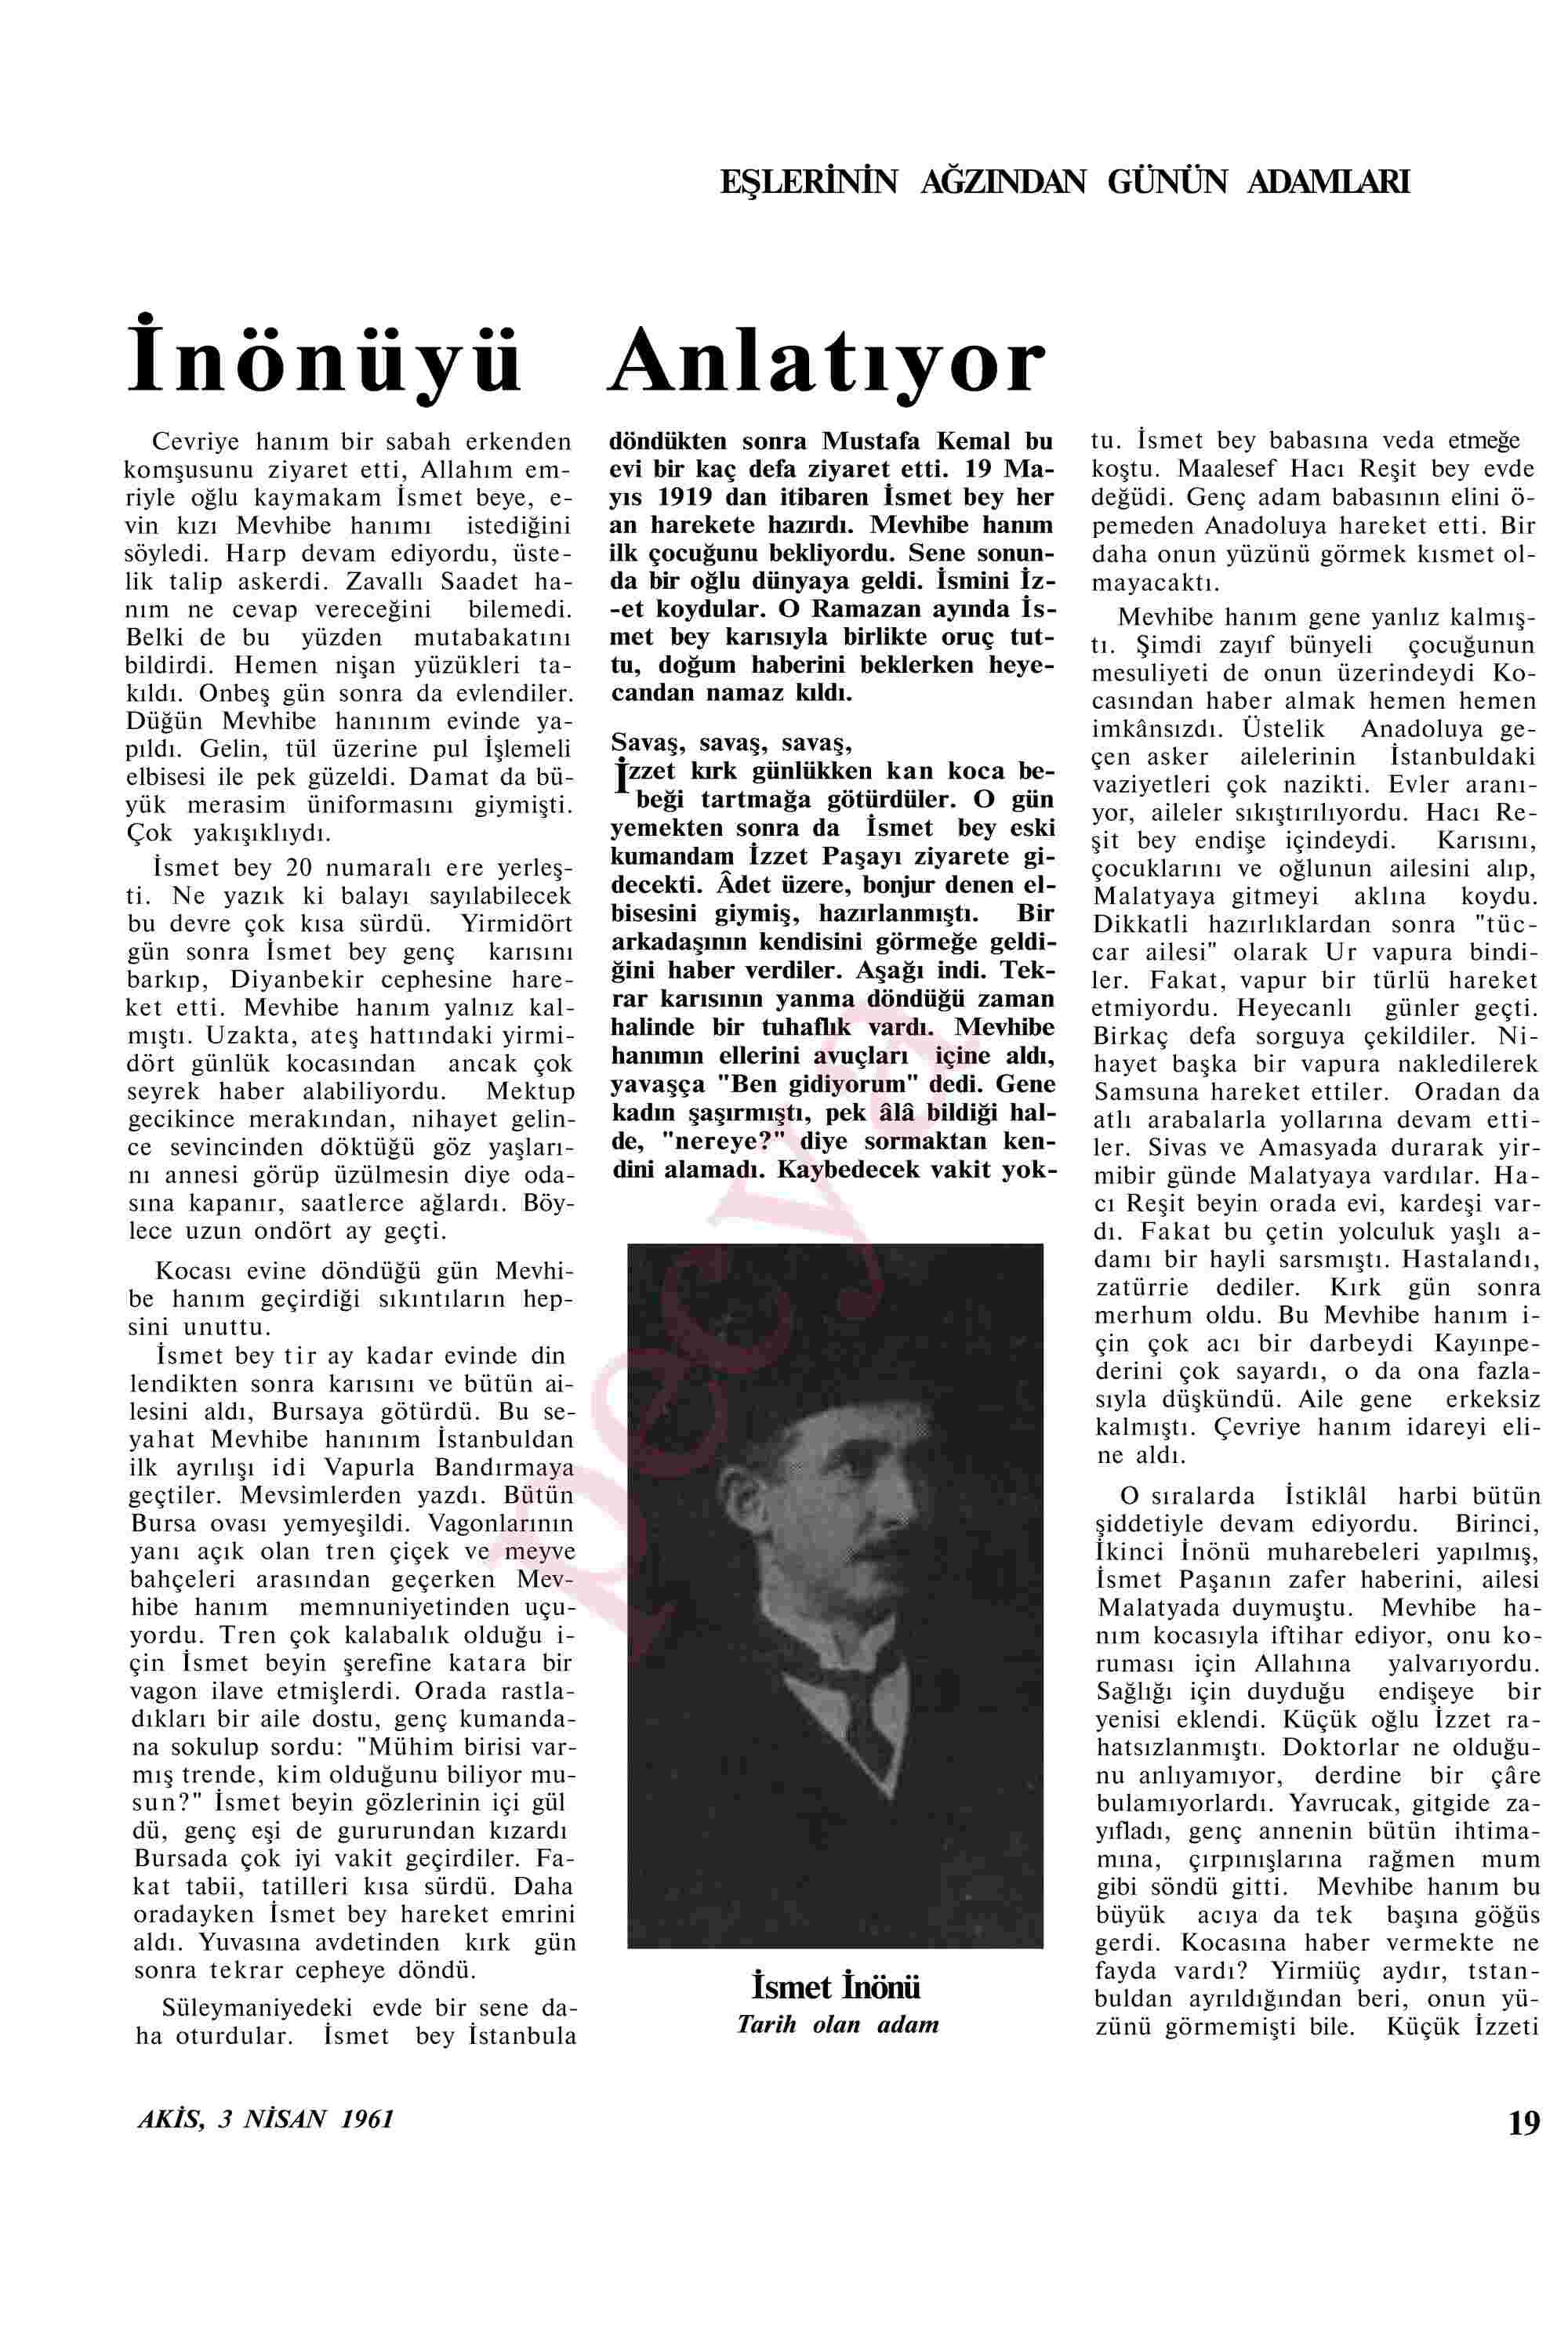 3 Nisan 1961 Tarihli Akis Dergisi Sayfa 19